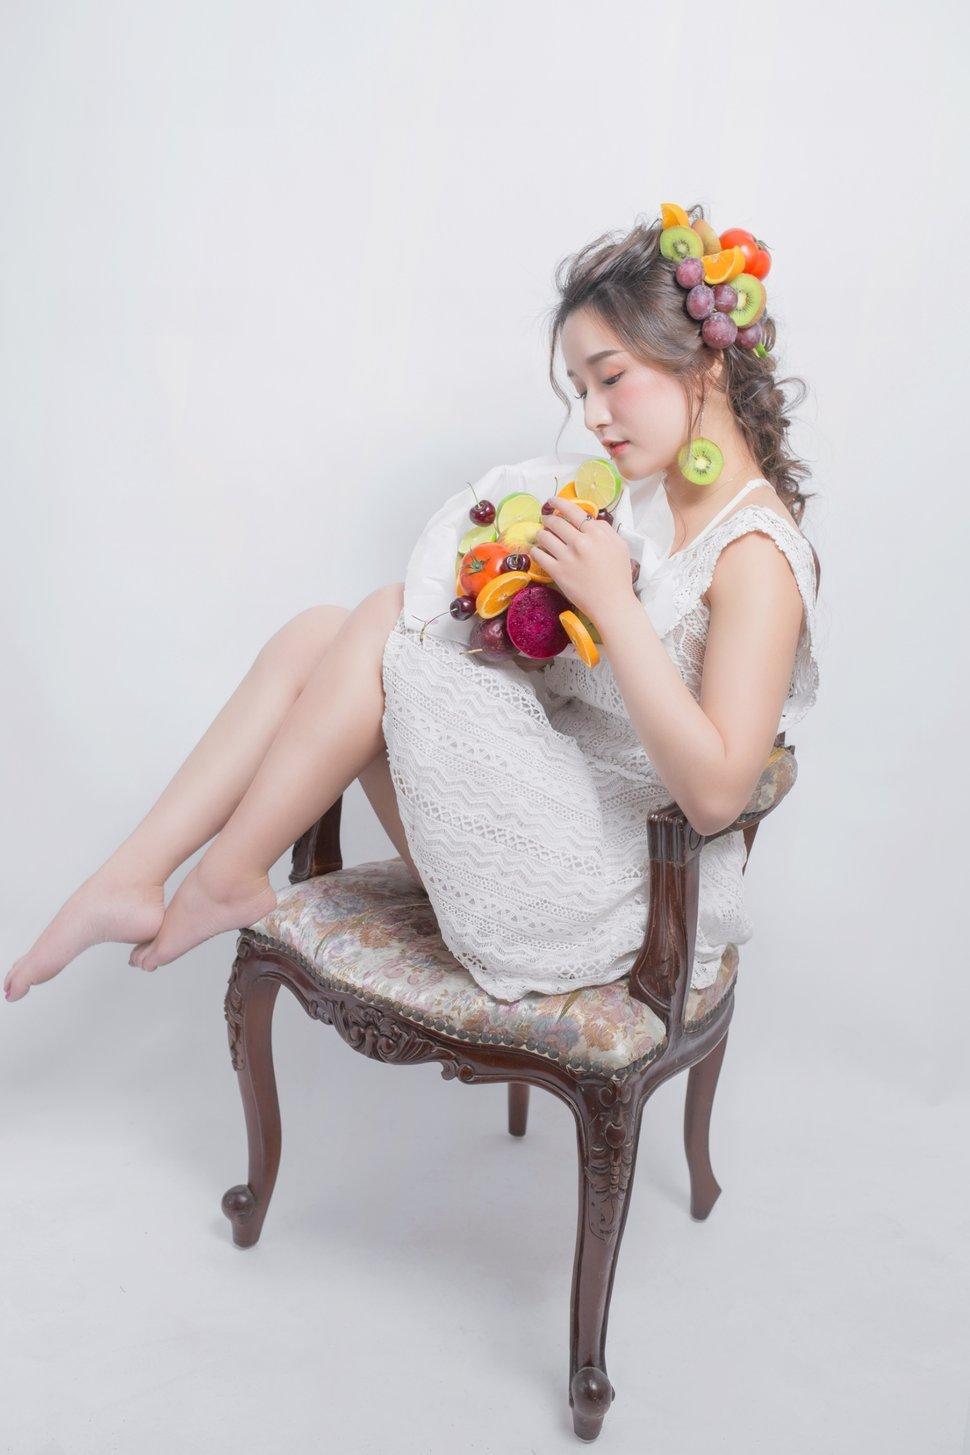 20180716_190410_0006 - Zona時尚美甲x新娘秘書整體造型工作室《結婚吧》